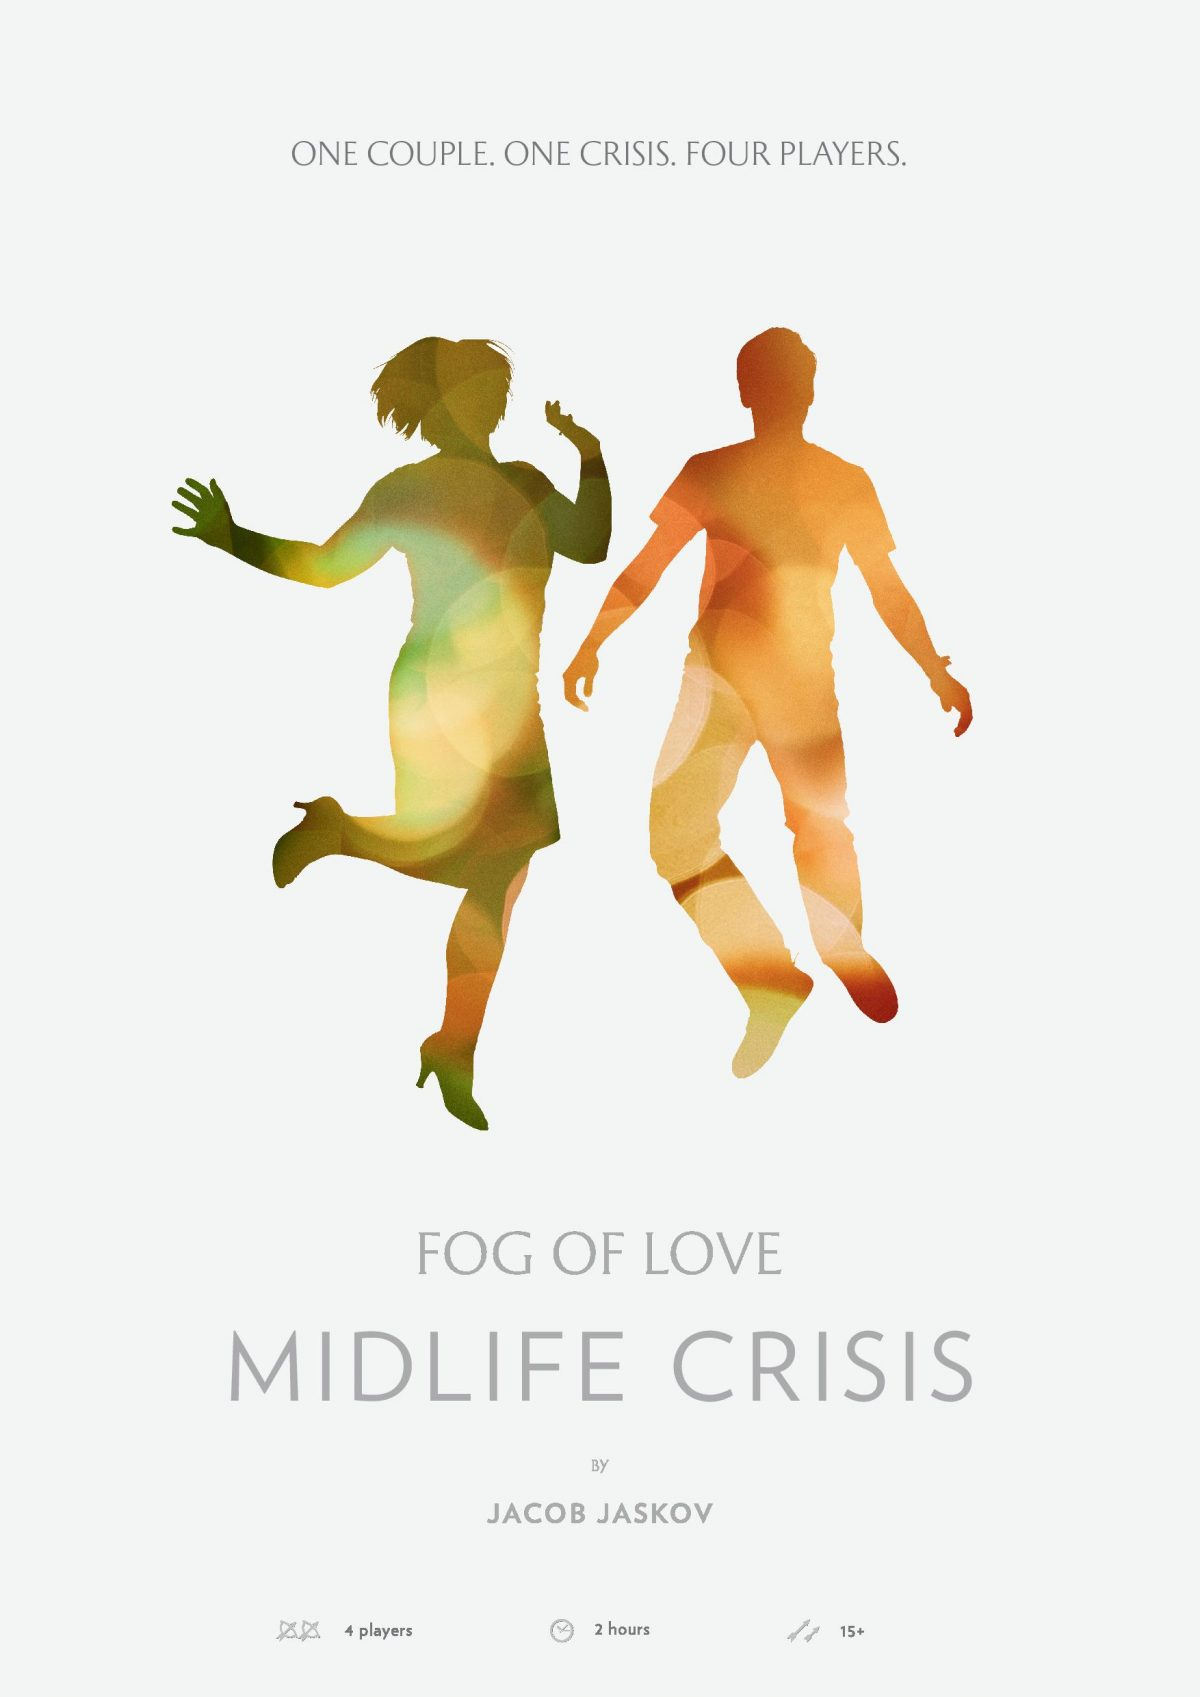 Fog of Love: Midlife Crisis by Jacob Jaskov - Fastaval